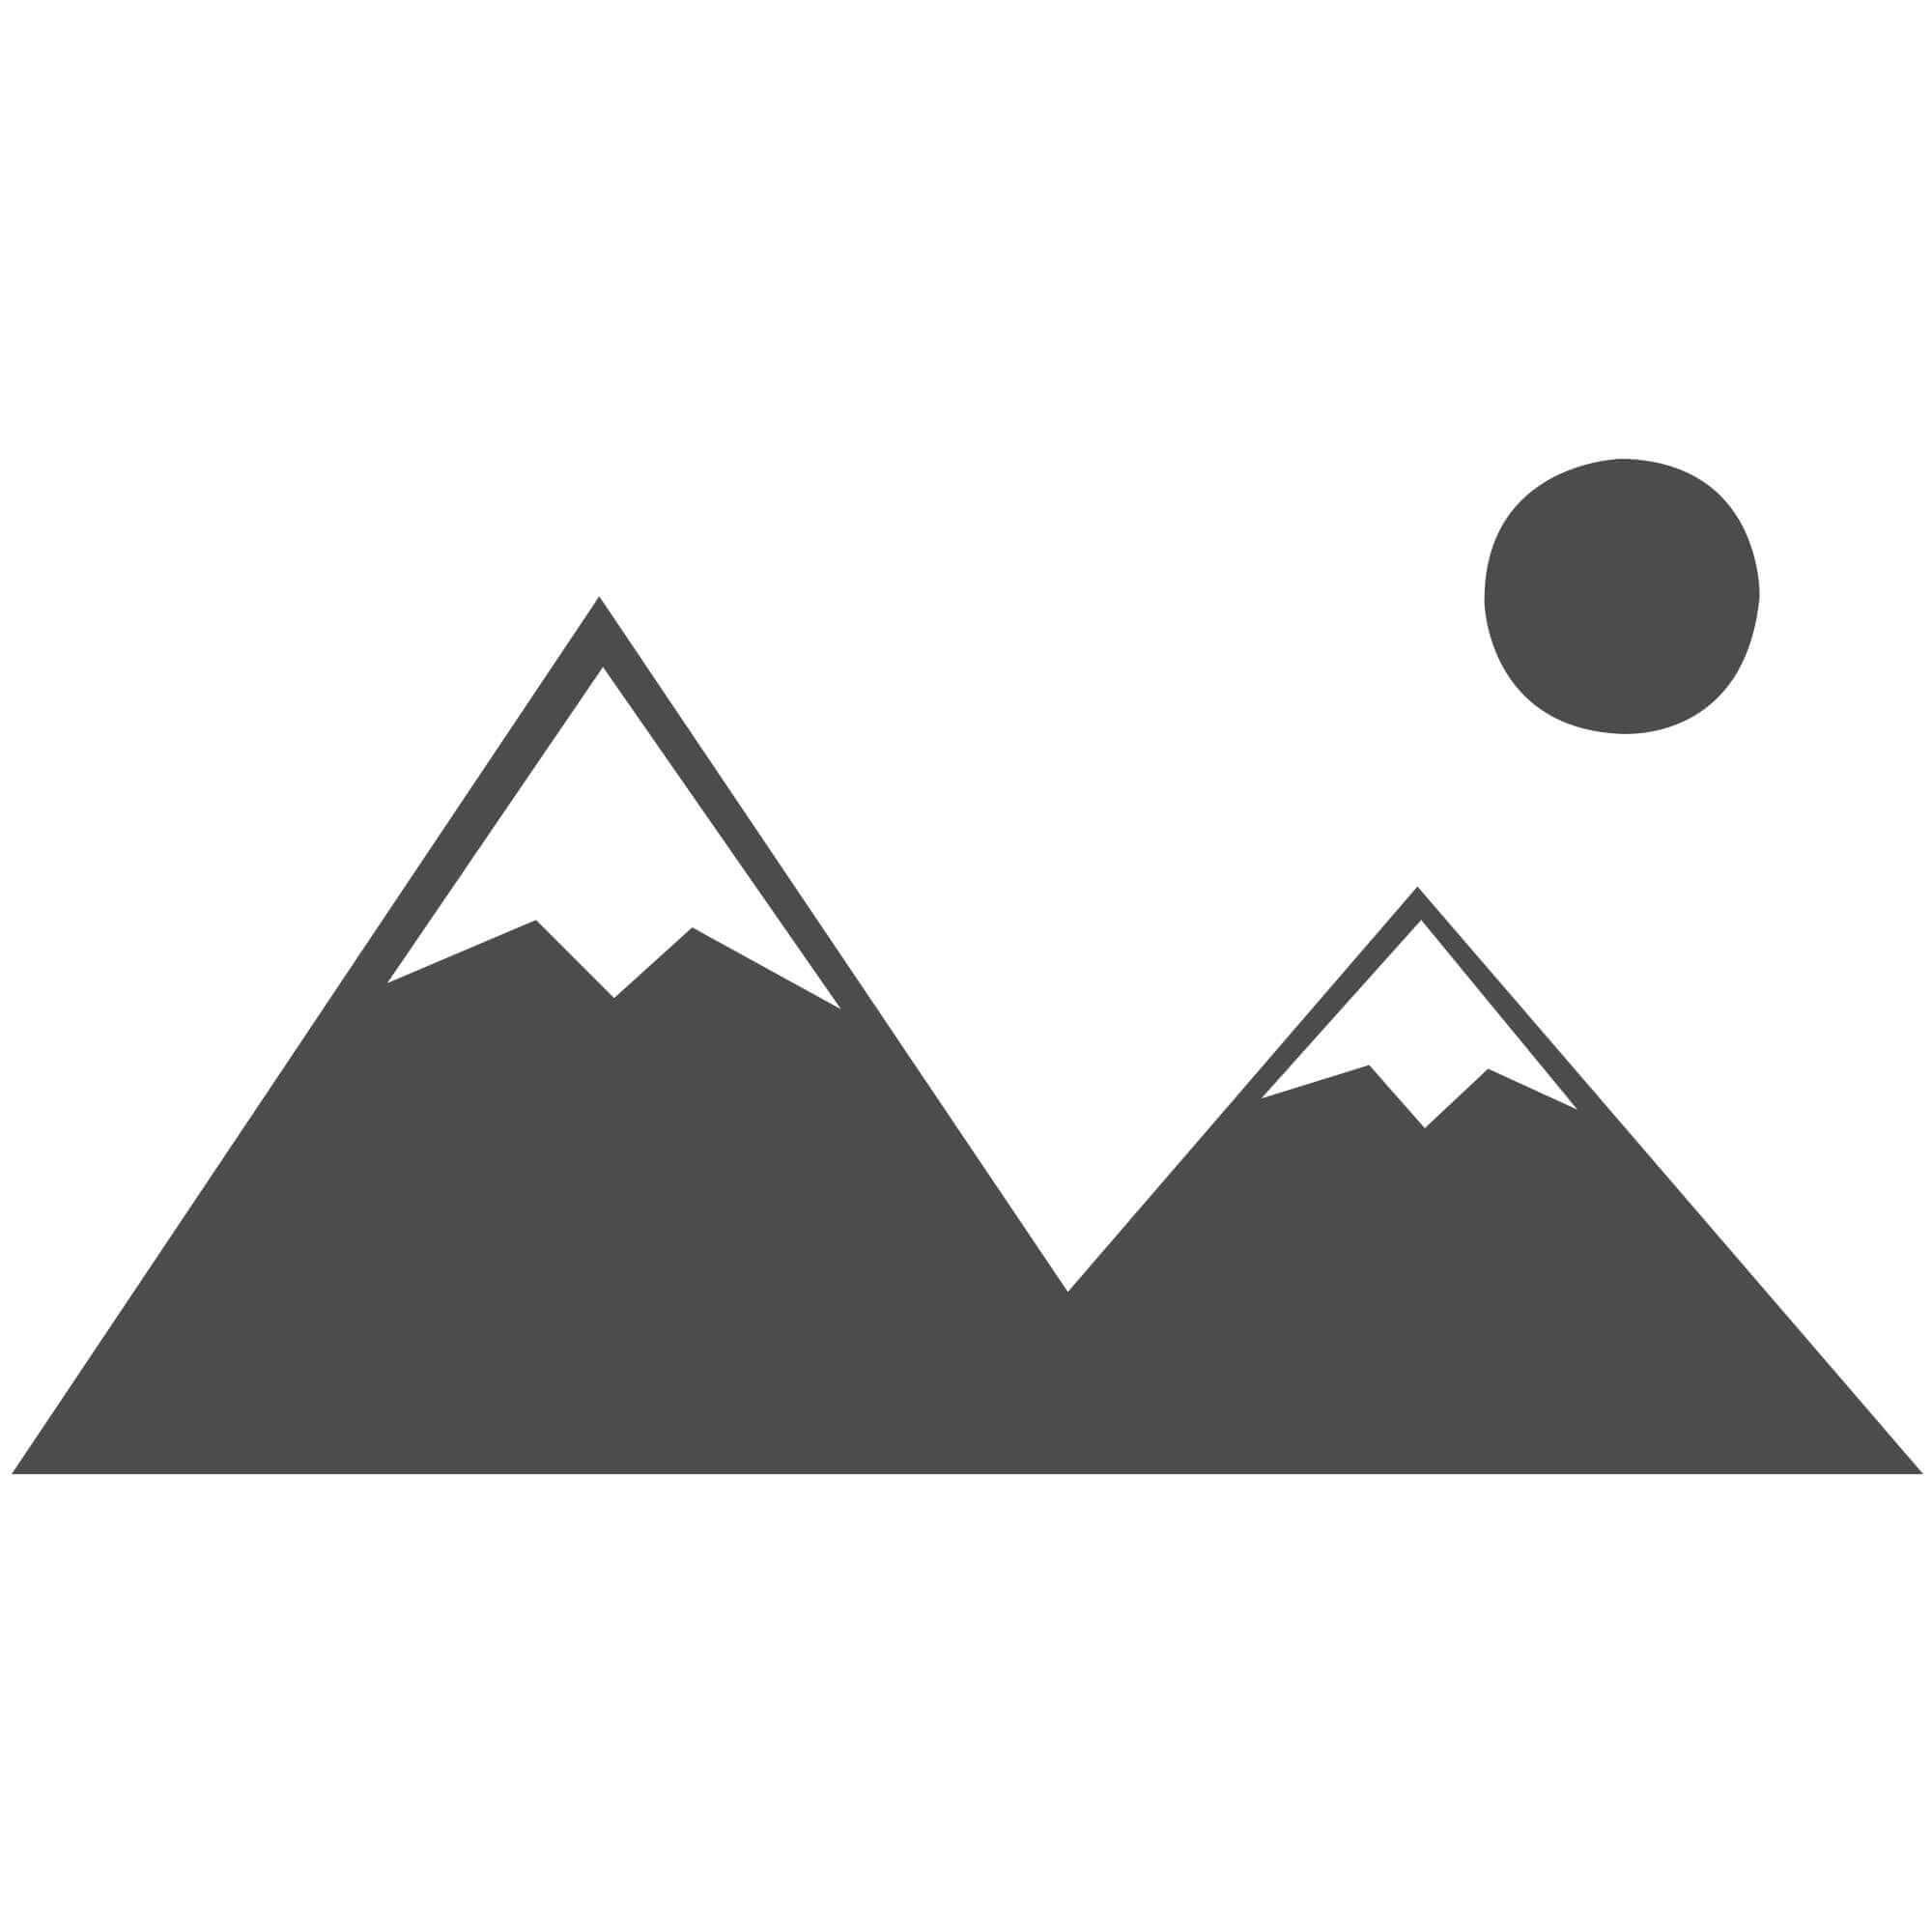 "Sierra Apollo Rug - Beige - Square 200 x 200 cm (6'6"" x 6'6"")"